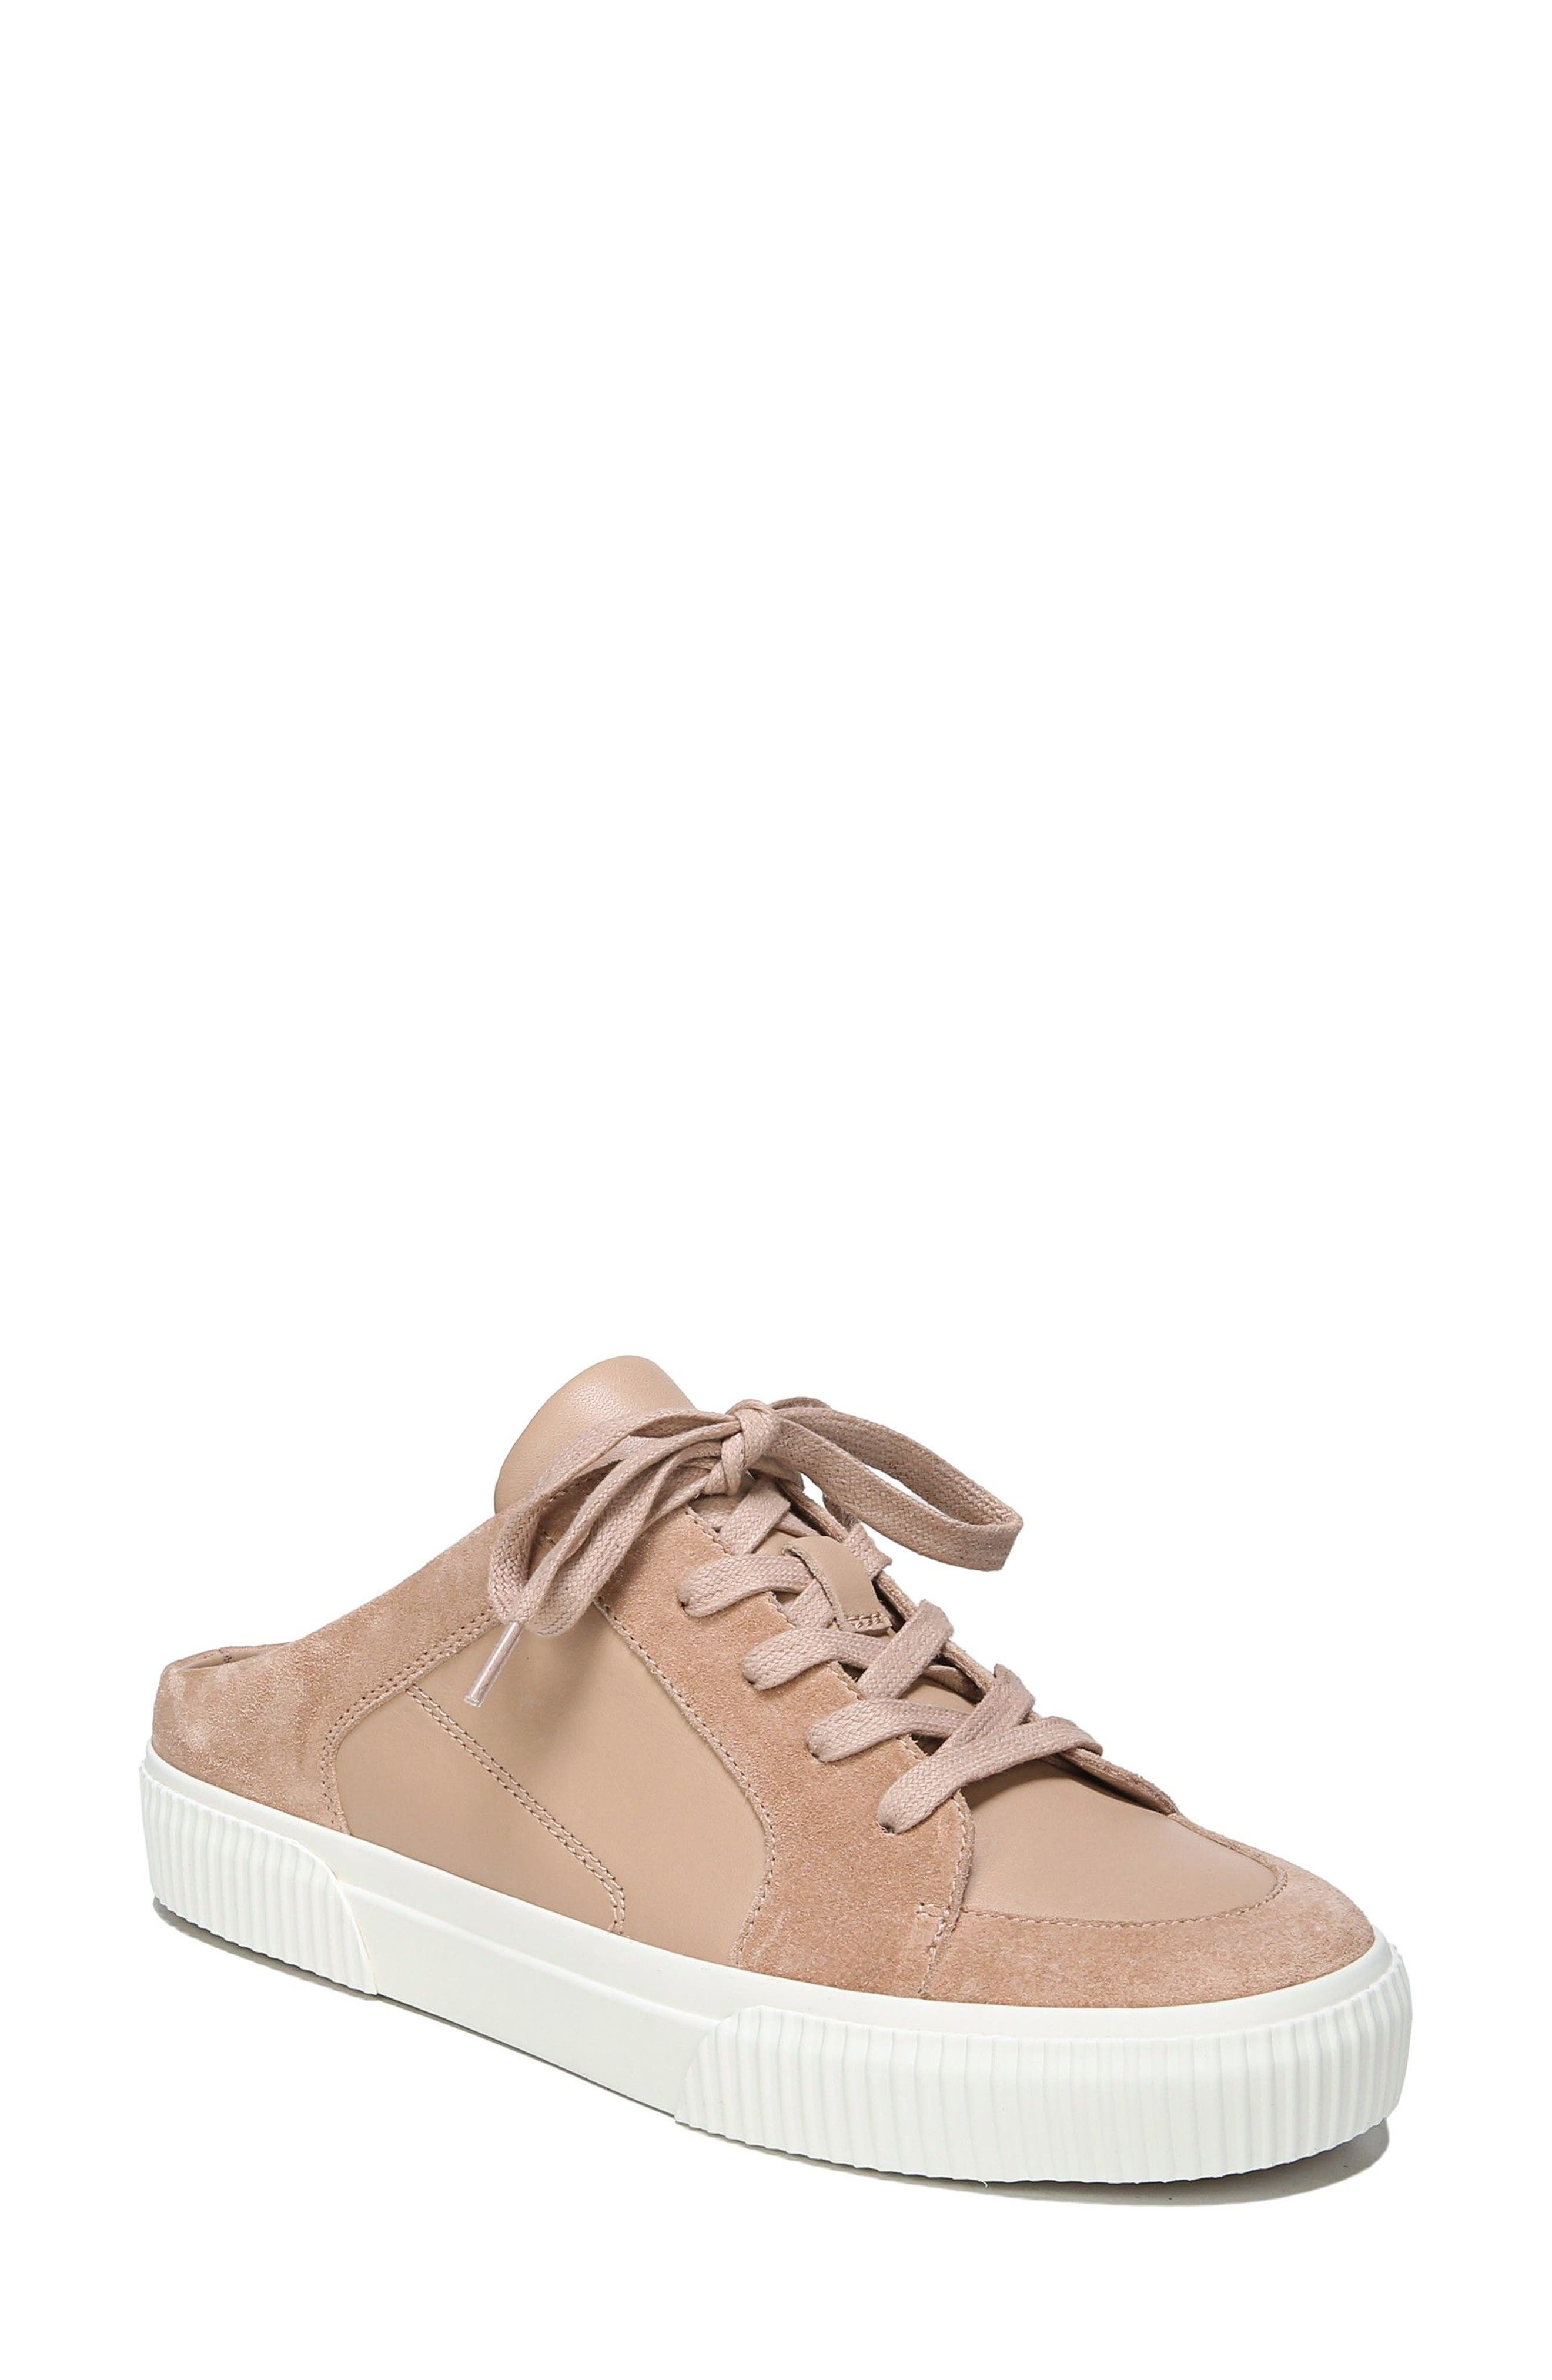 Kess Slip-On Sneaker,                             Main thumbnail 1, color,                             251